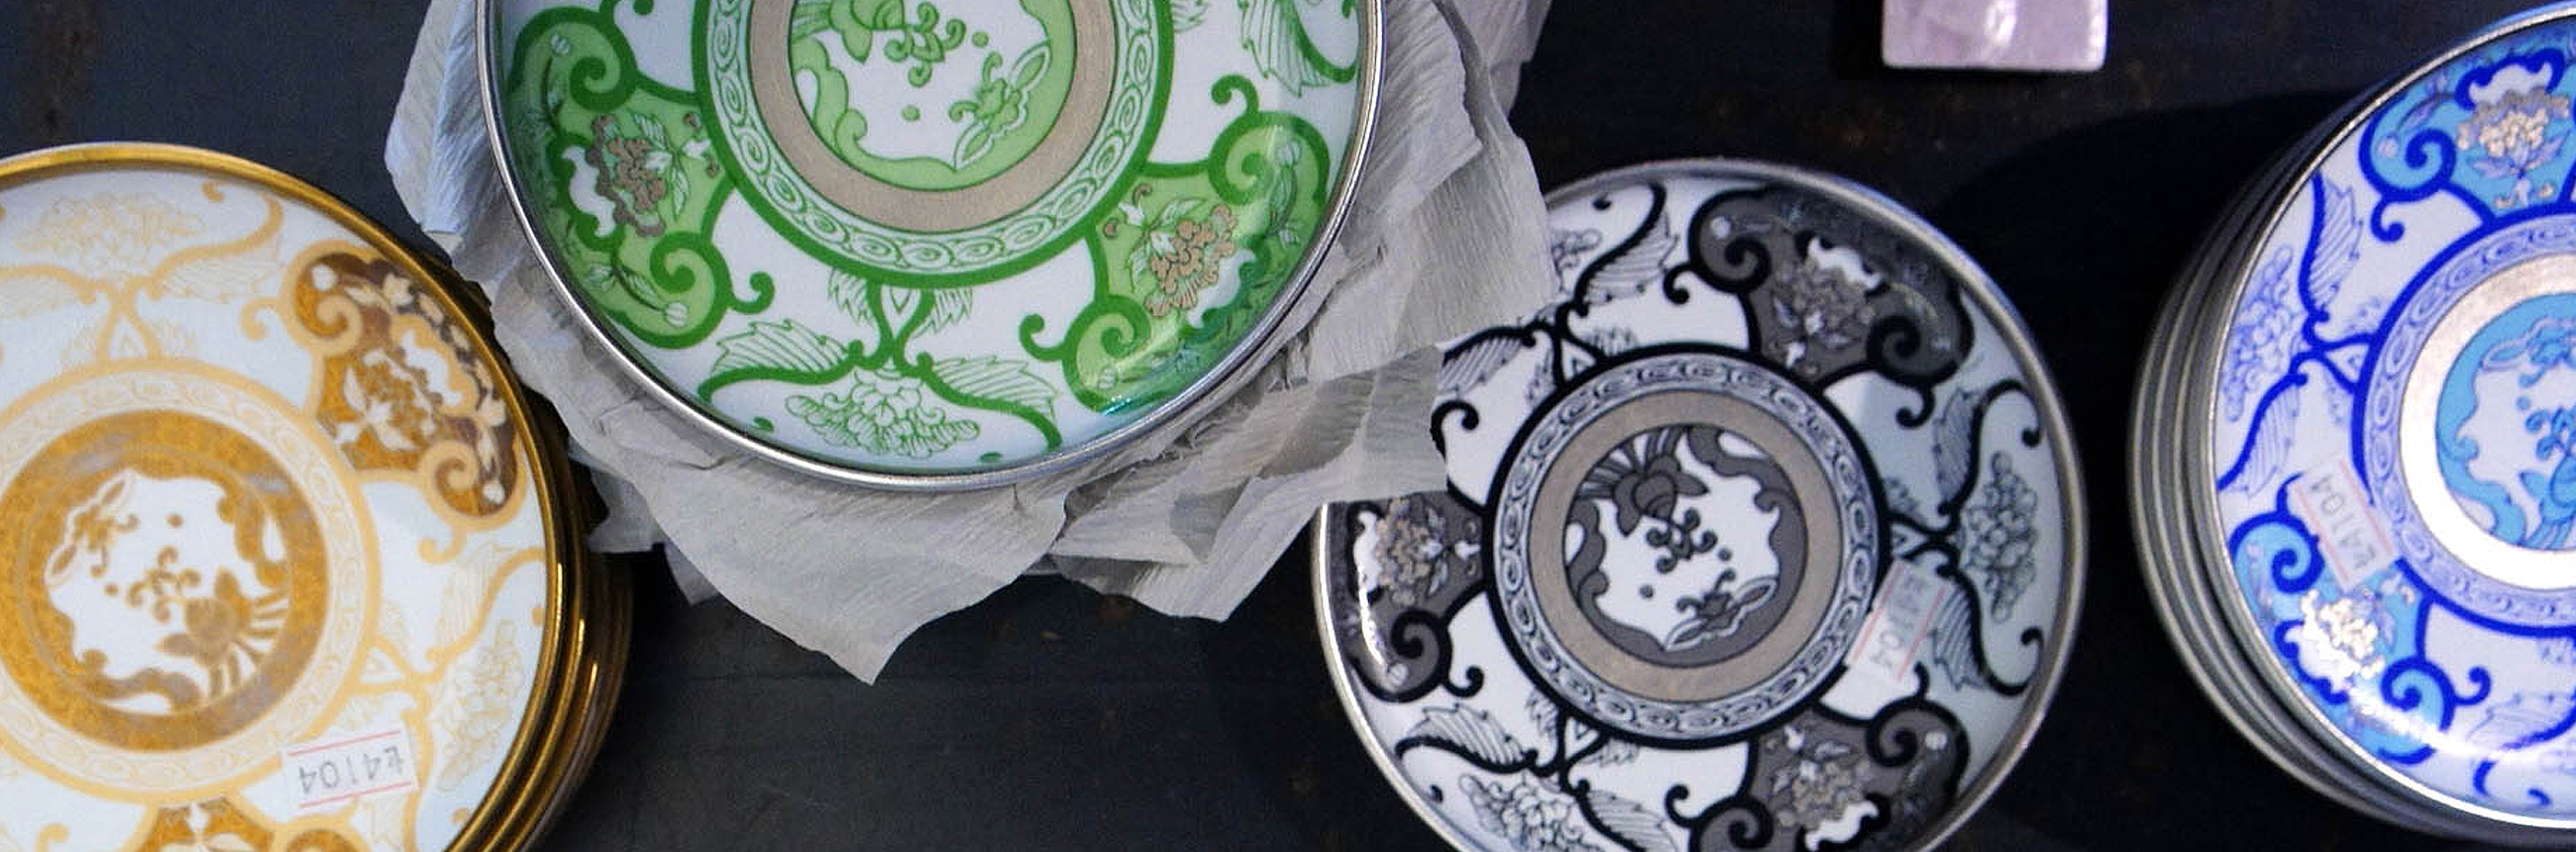 Arita Japanese Ceramics Collection ARITA ARITA – Beautiful accessories for a modern home Arita Japanese Ceramics Collection1